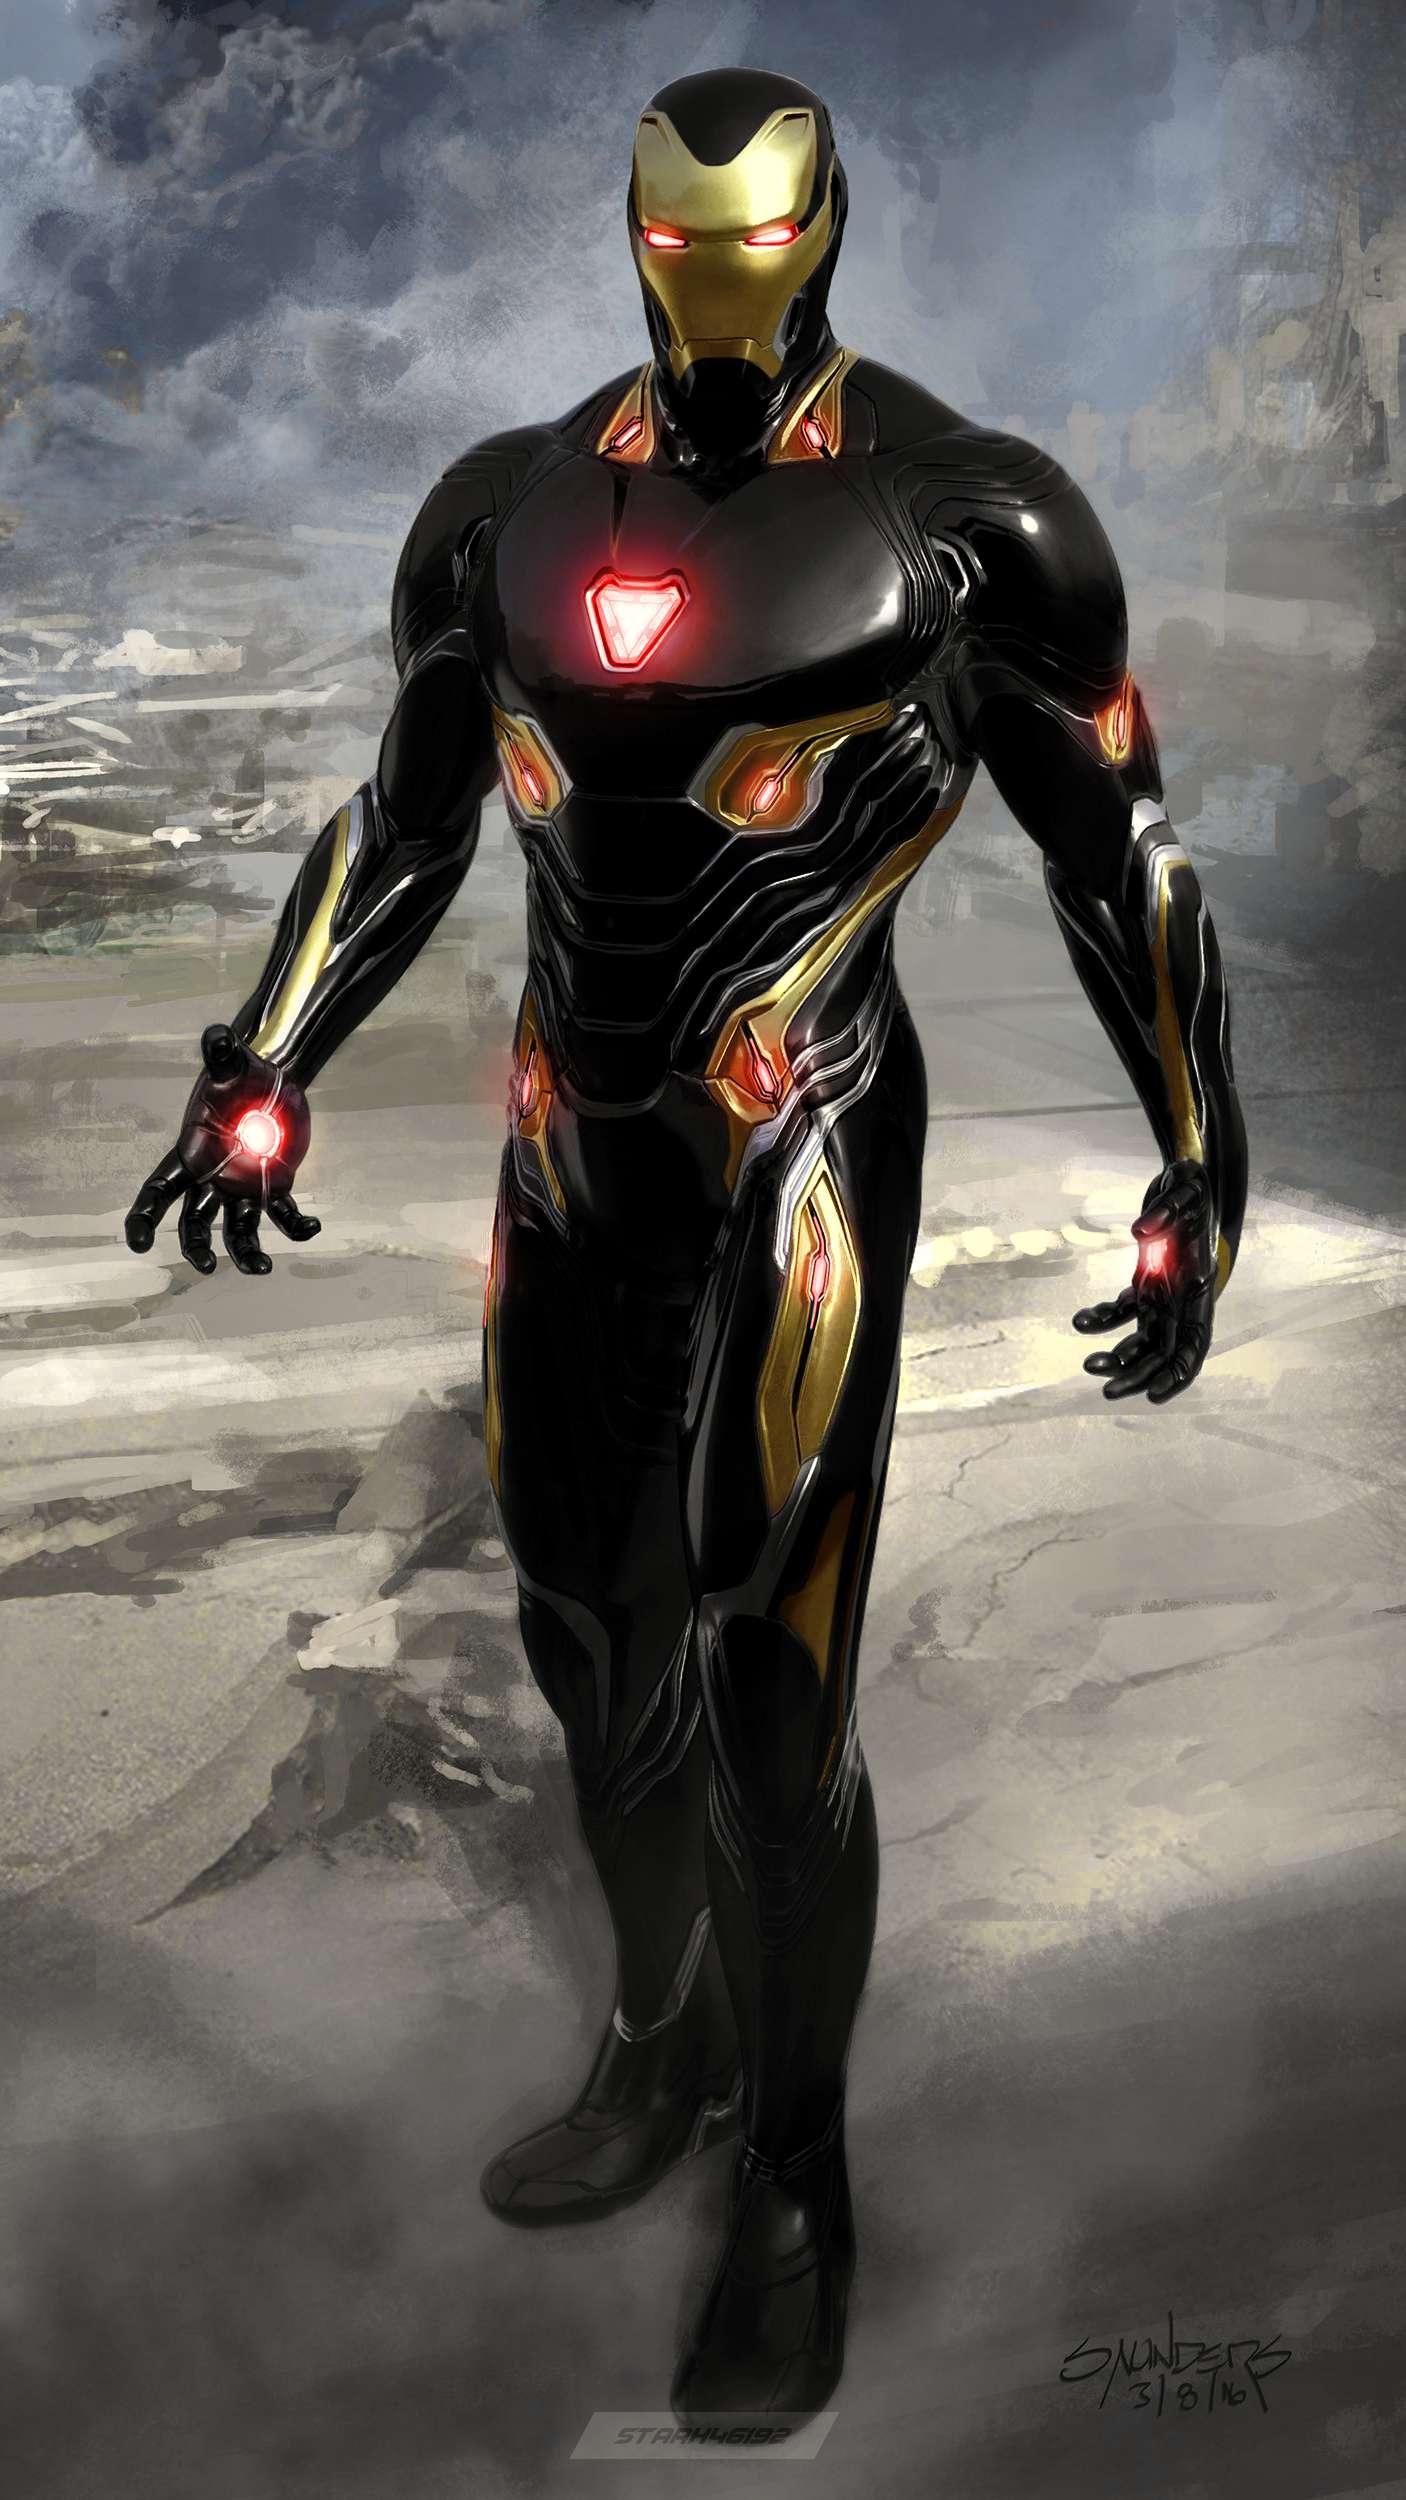 Black Armor Iron Man iPhone Wallpaper